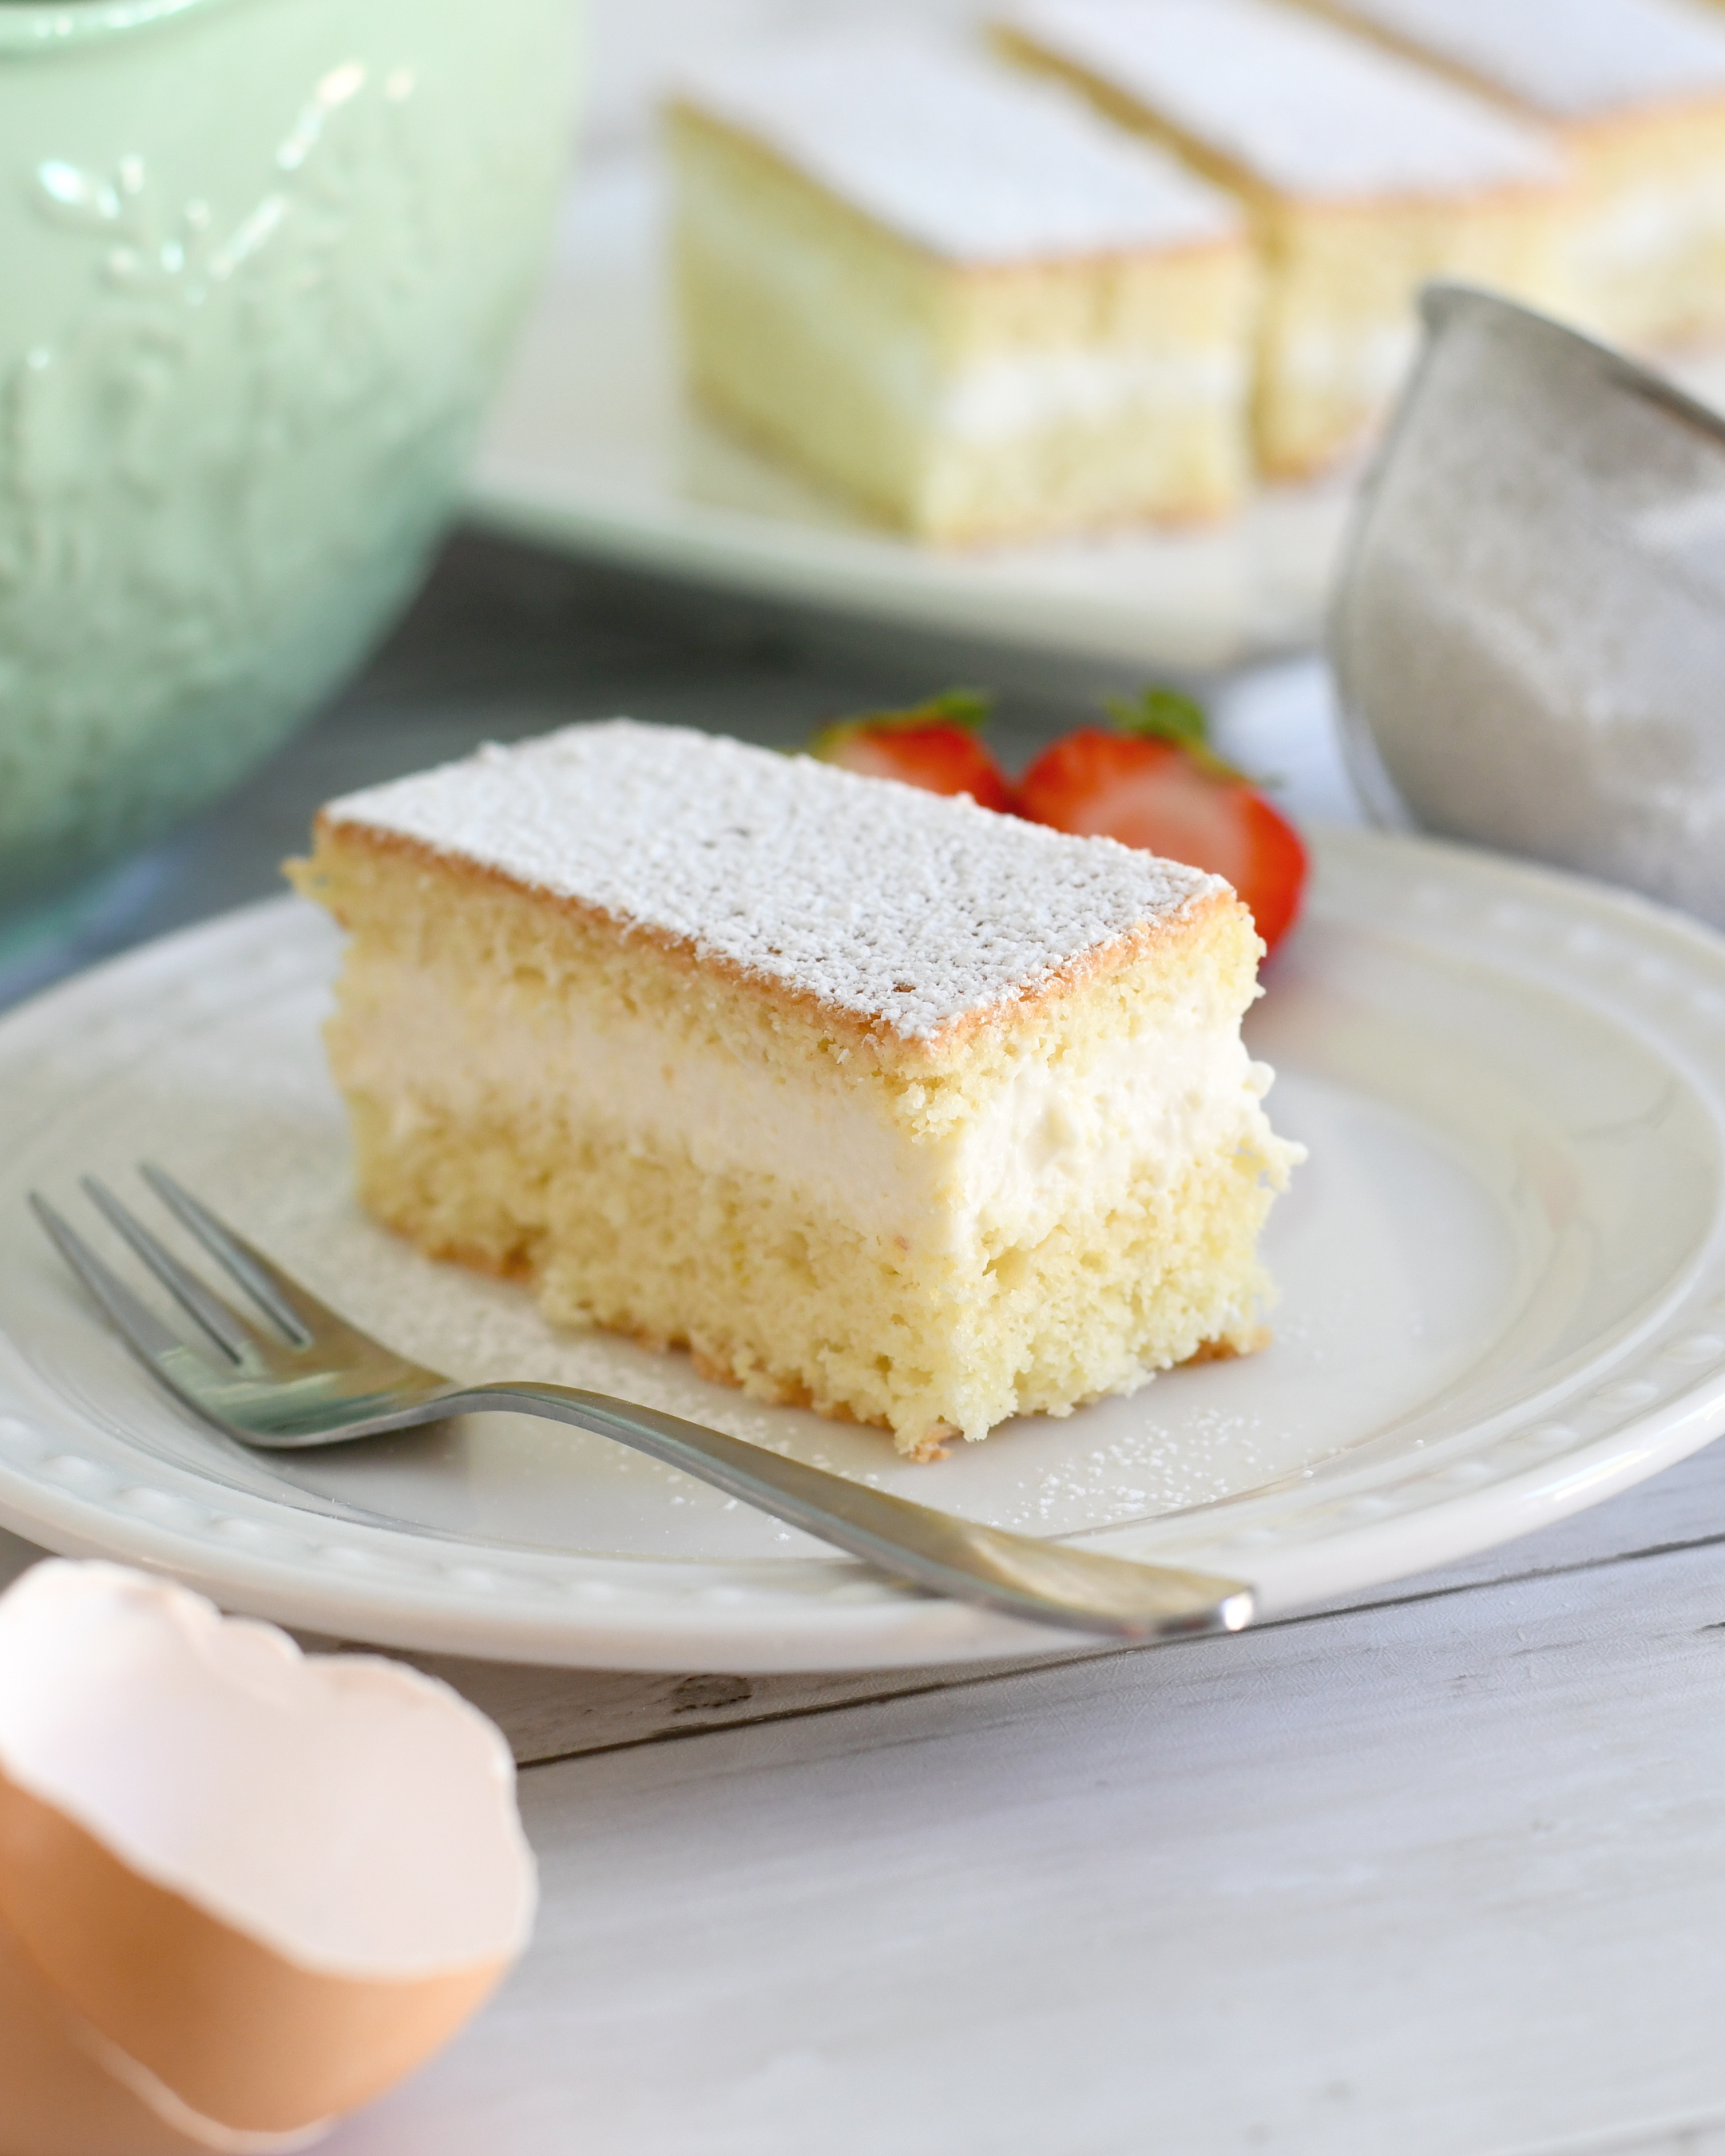 Torta paradiso - Italian Paradise Cake with Milk Cream